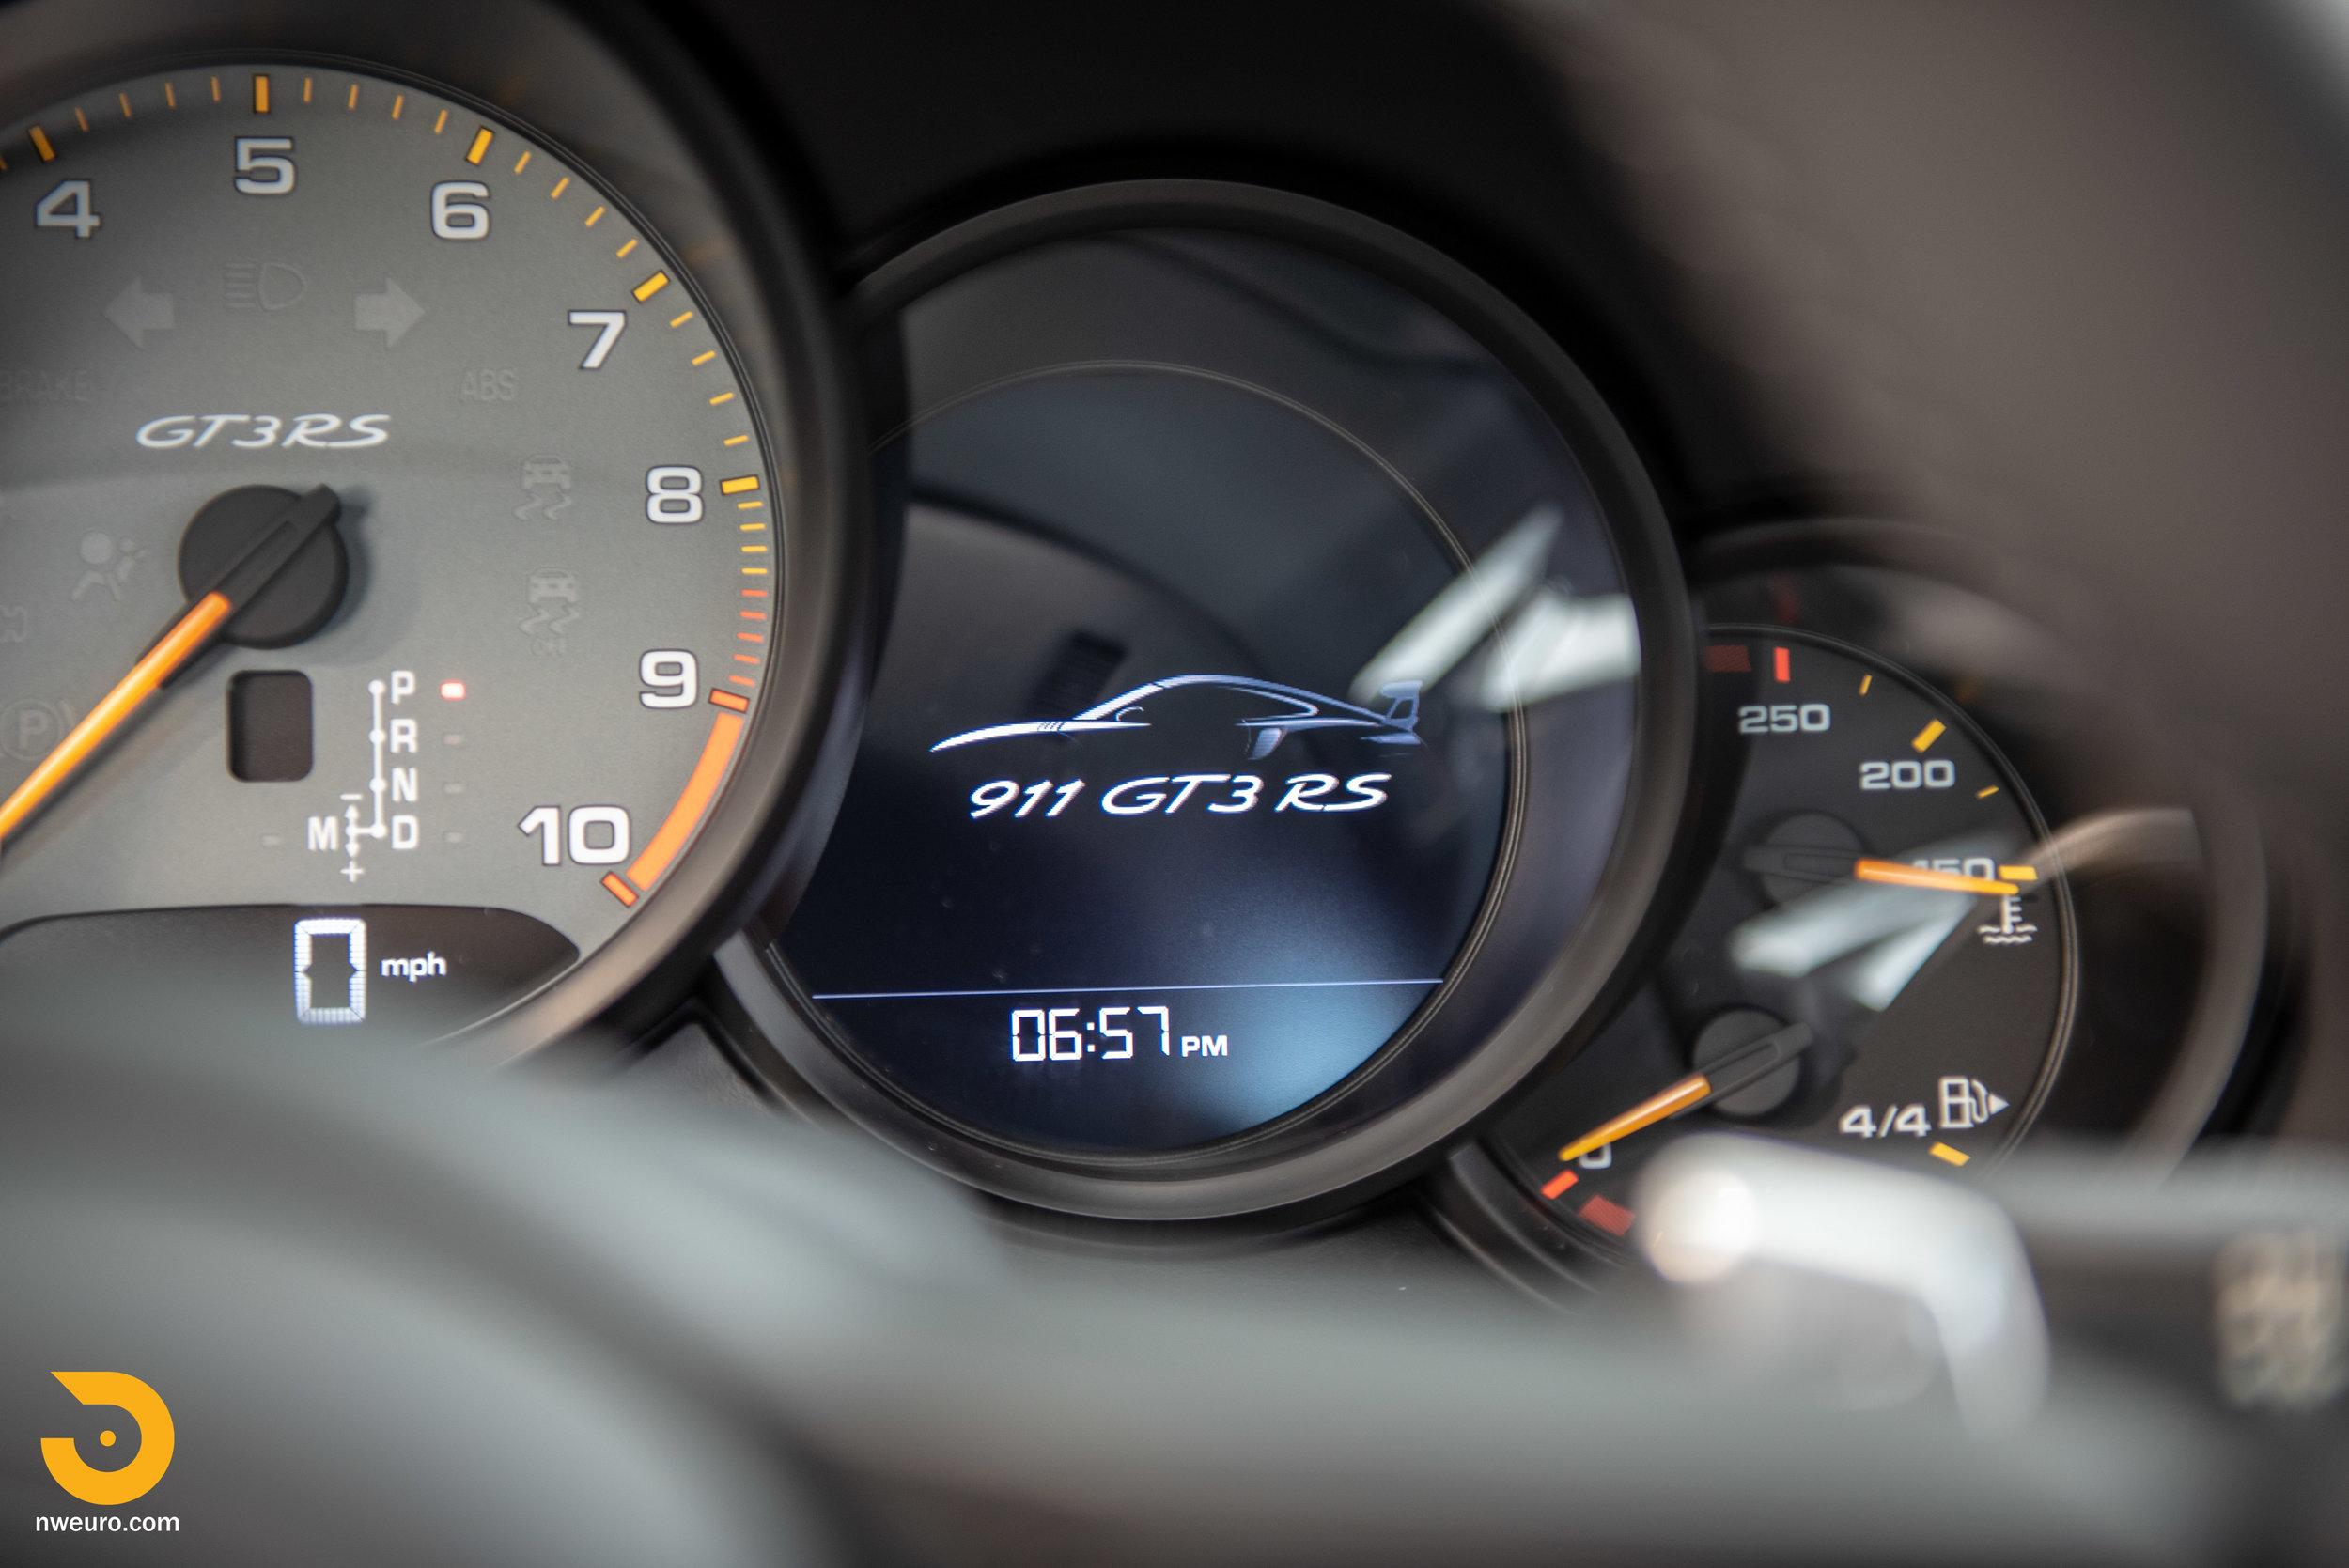 2019 Porsche GT3 RS - Chalk-29.jpg